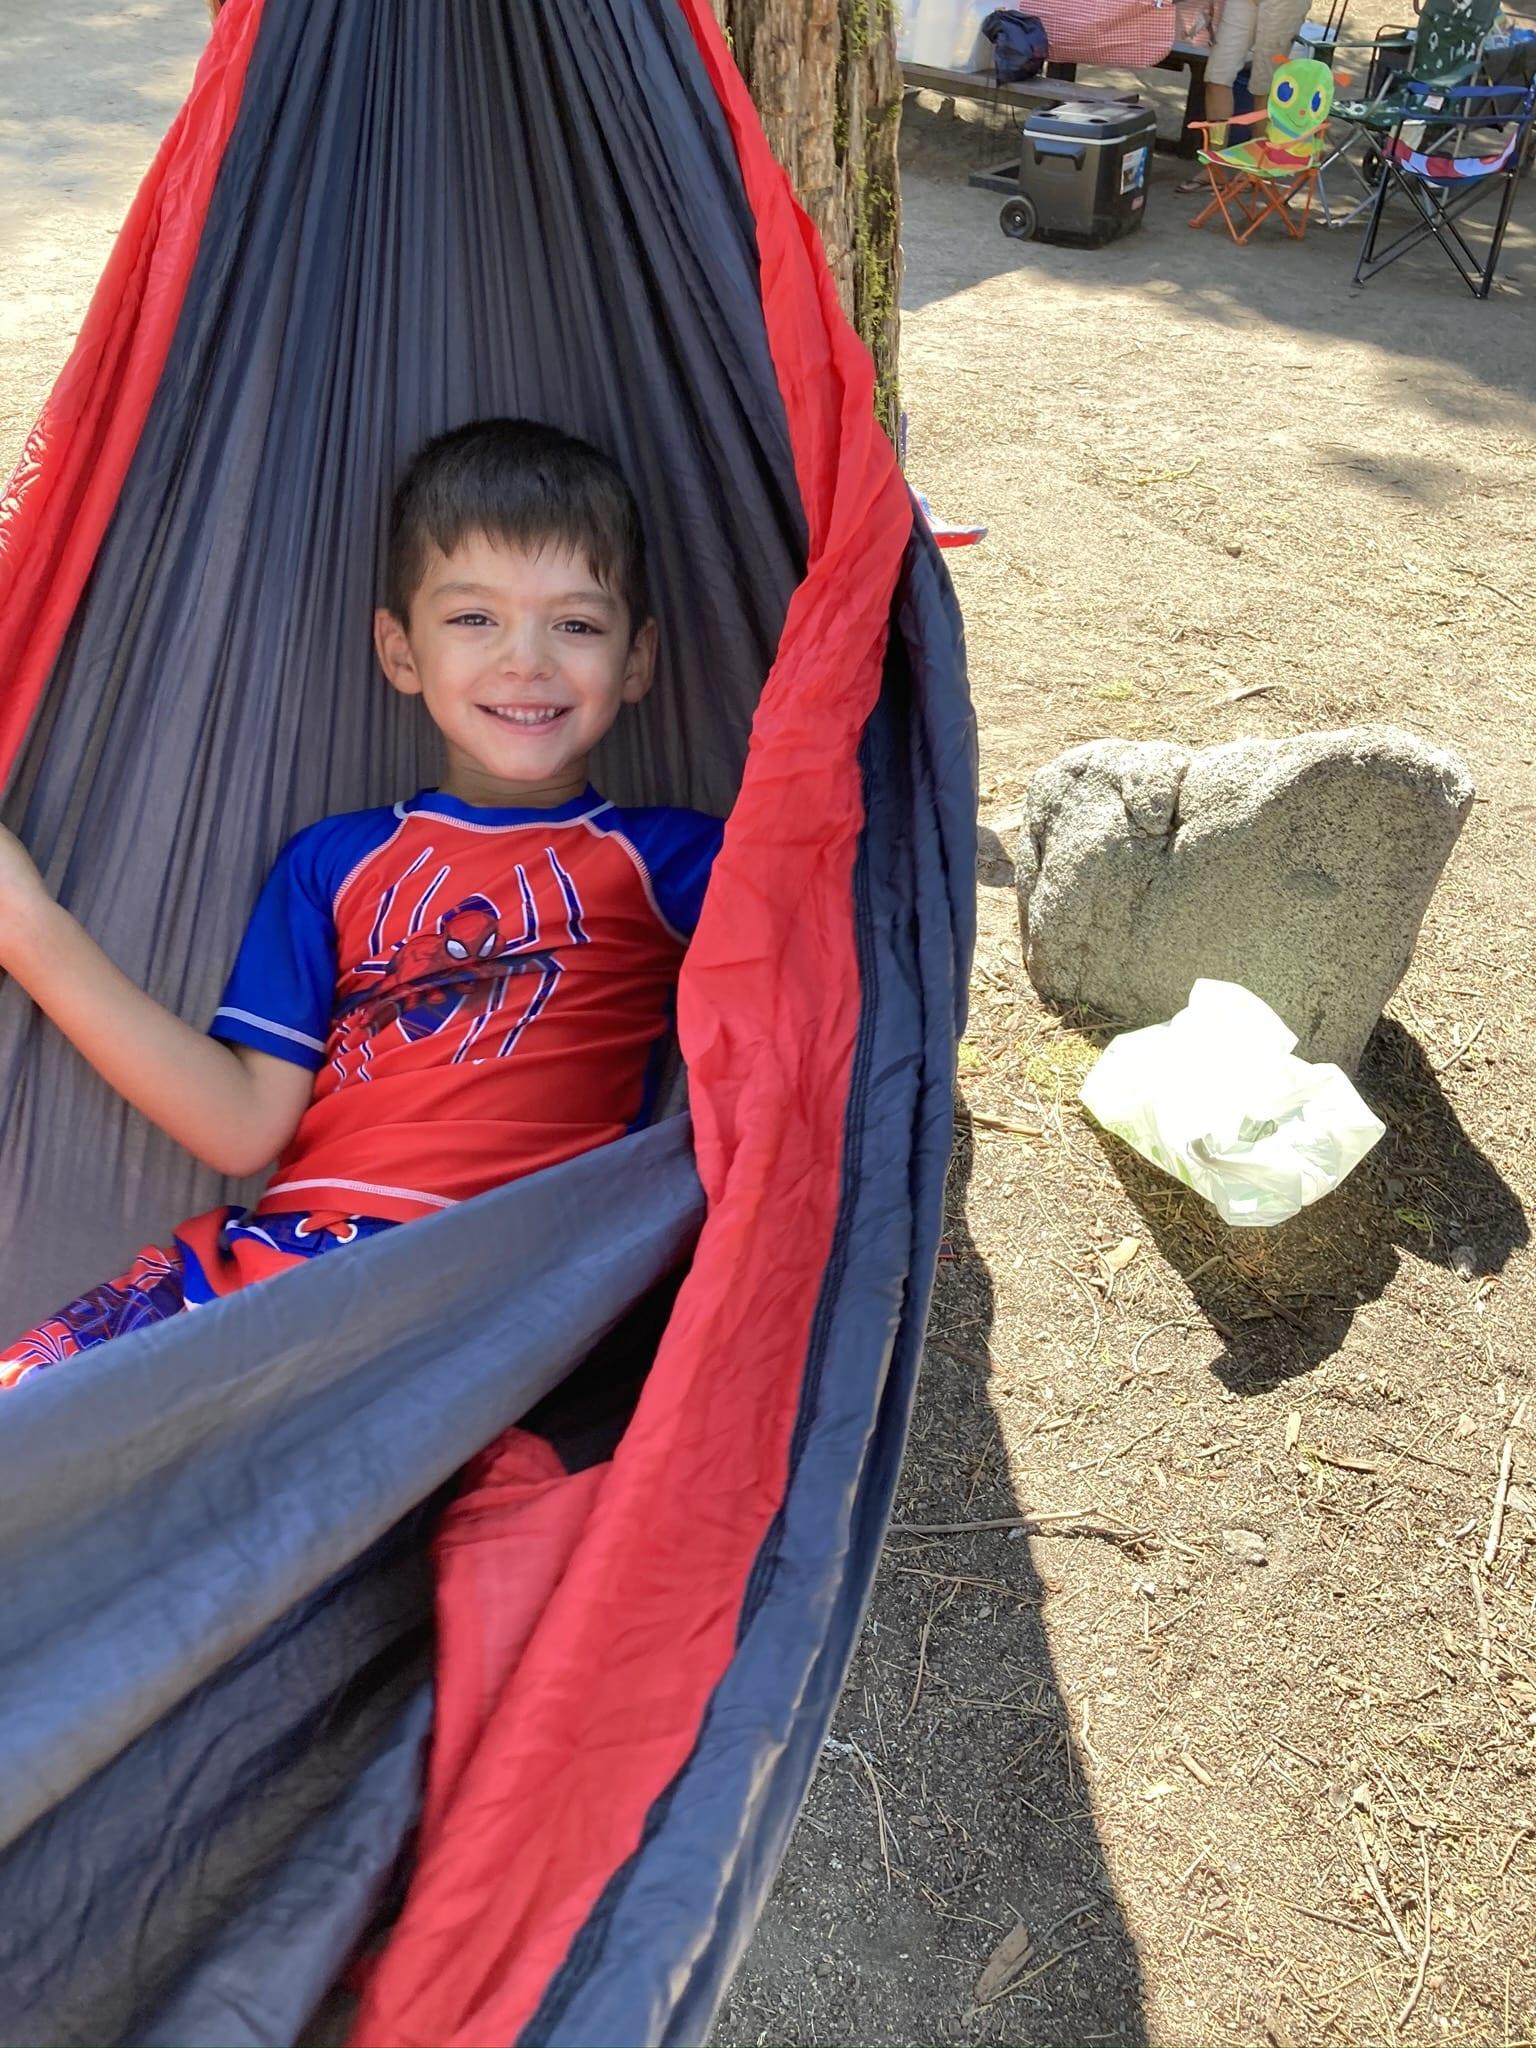 JJ in a Camping Hammock